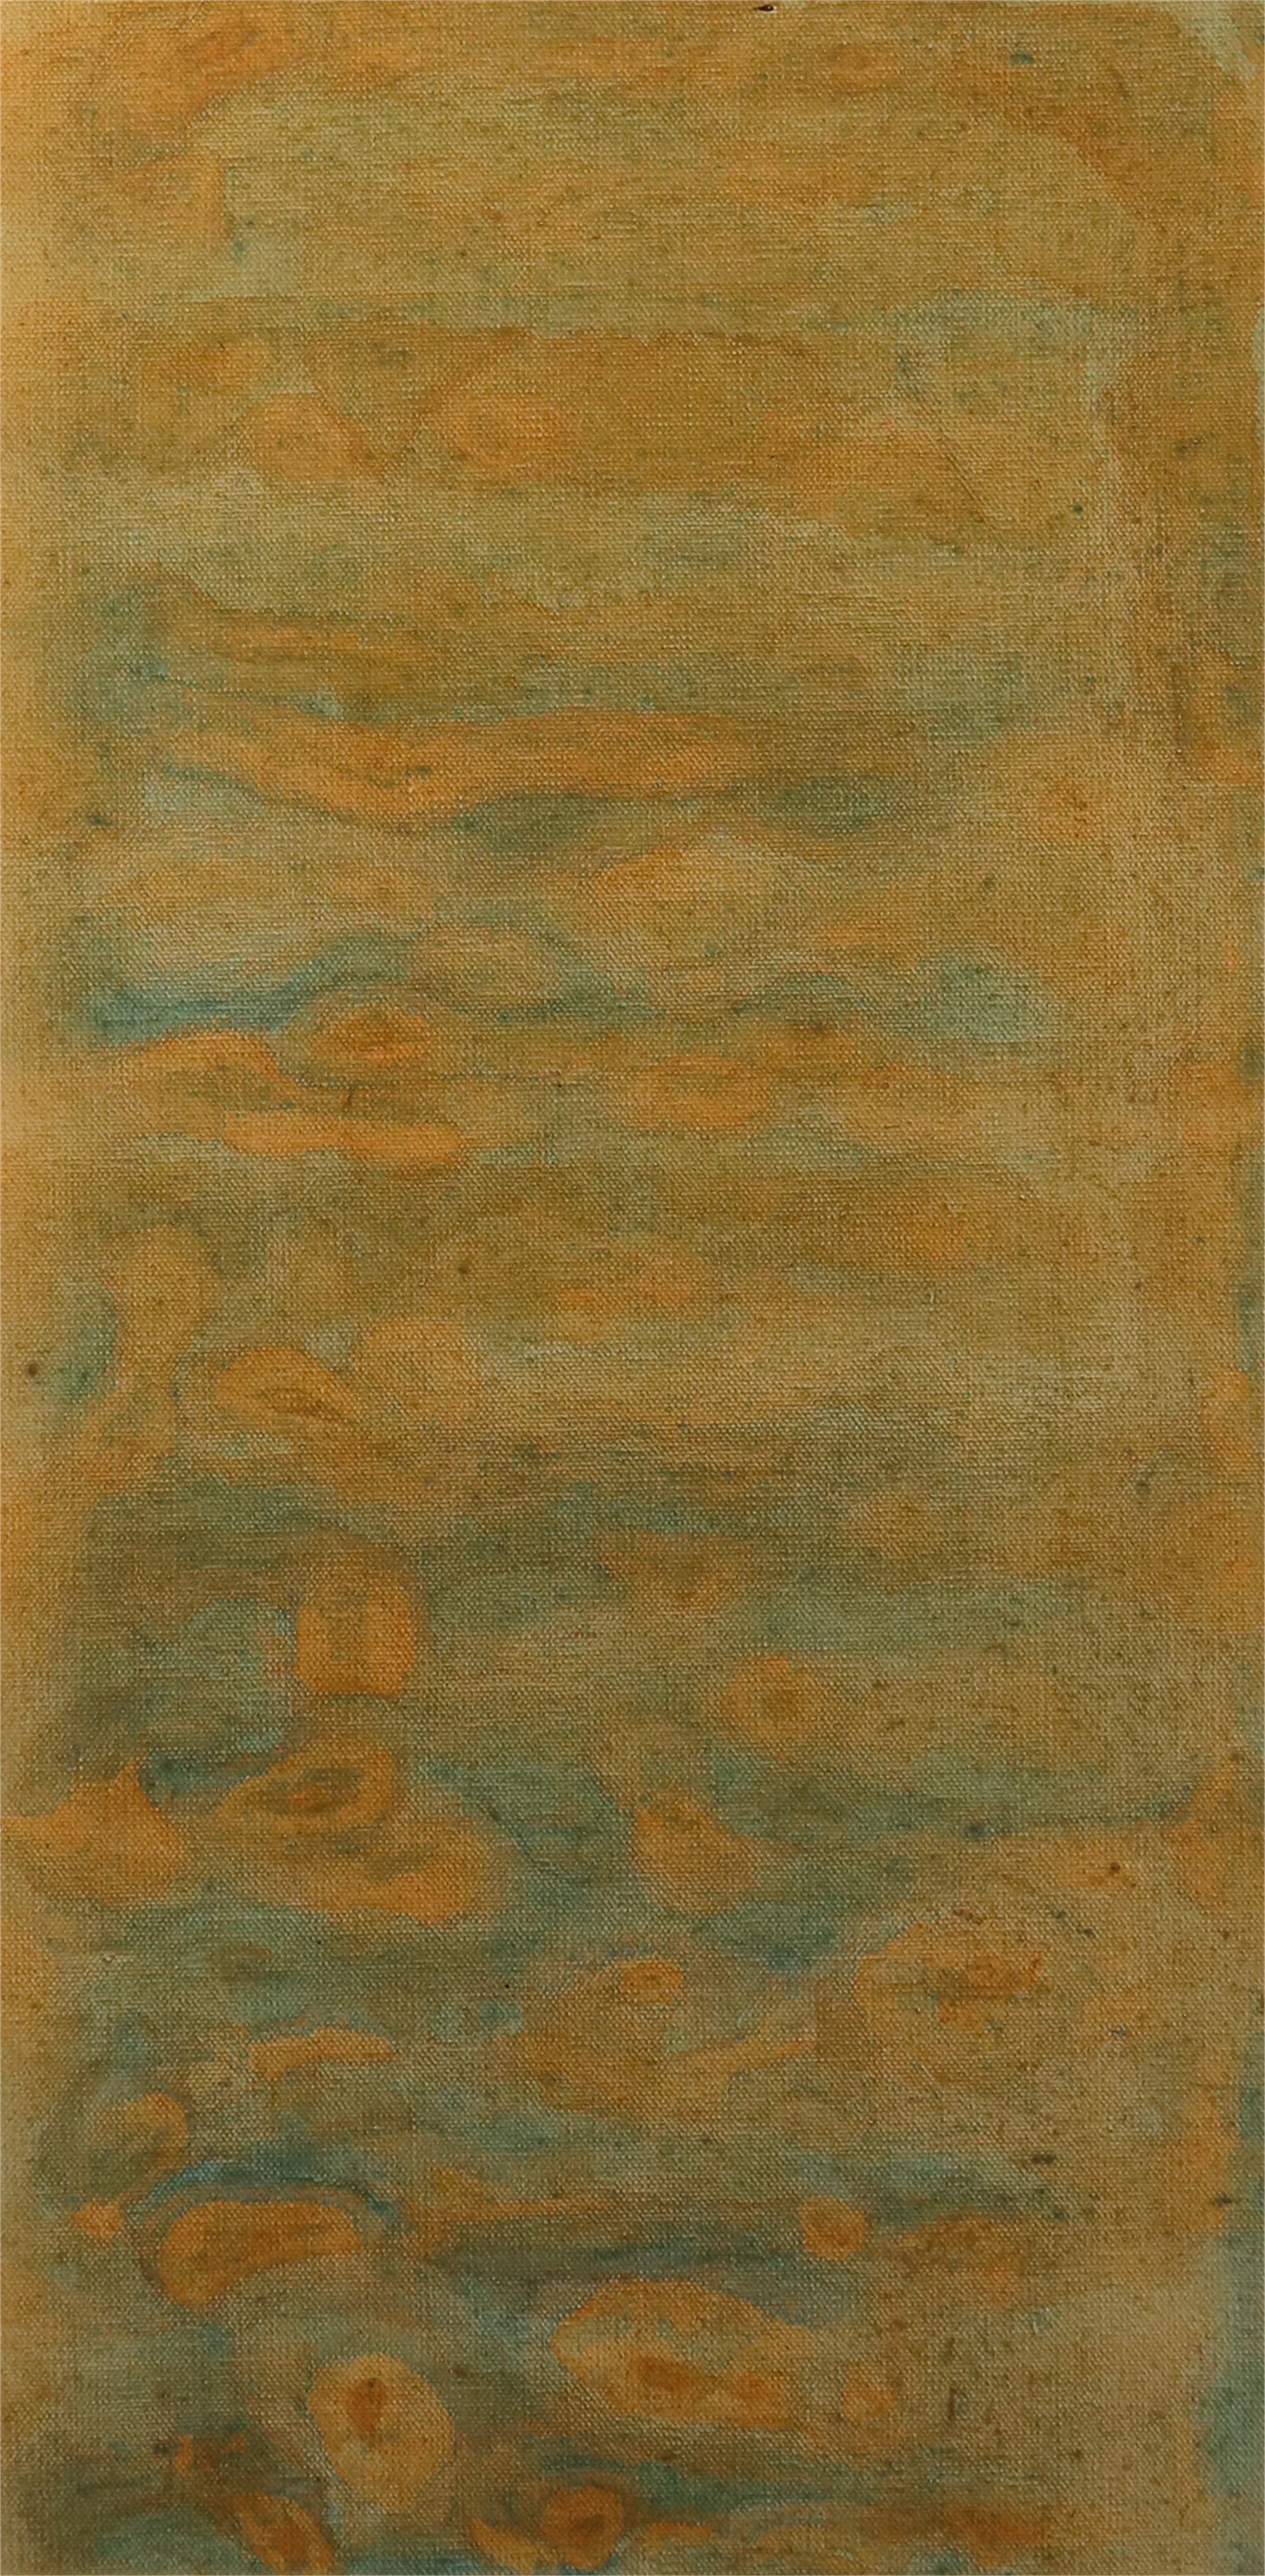 Codex II by Steven Anton Rehage